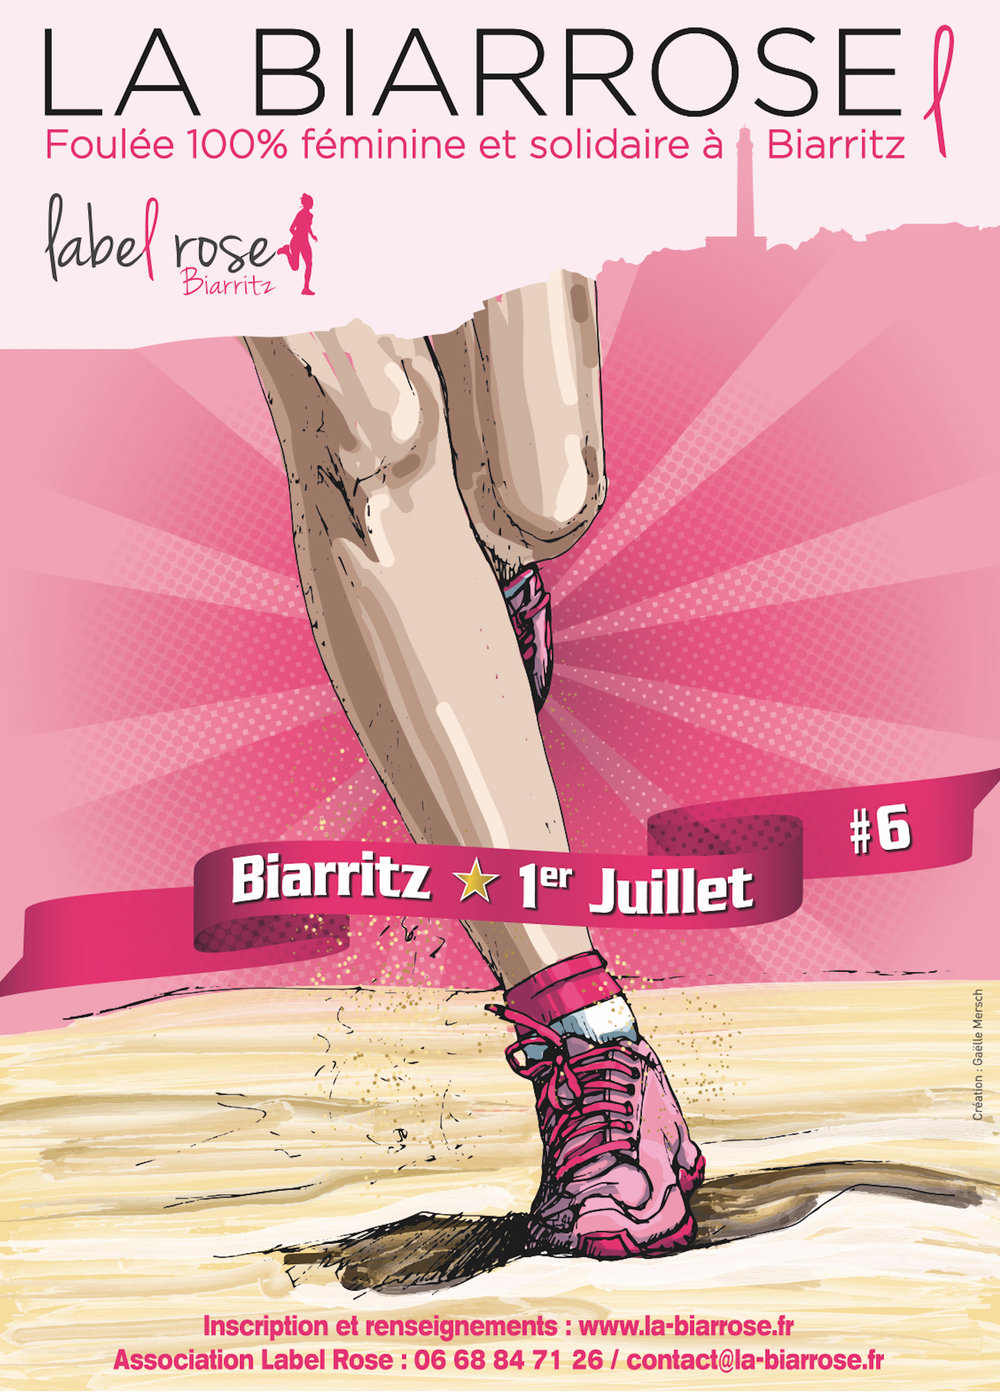 osteopathe-biarritz-biarrose-2018.jpg